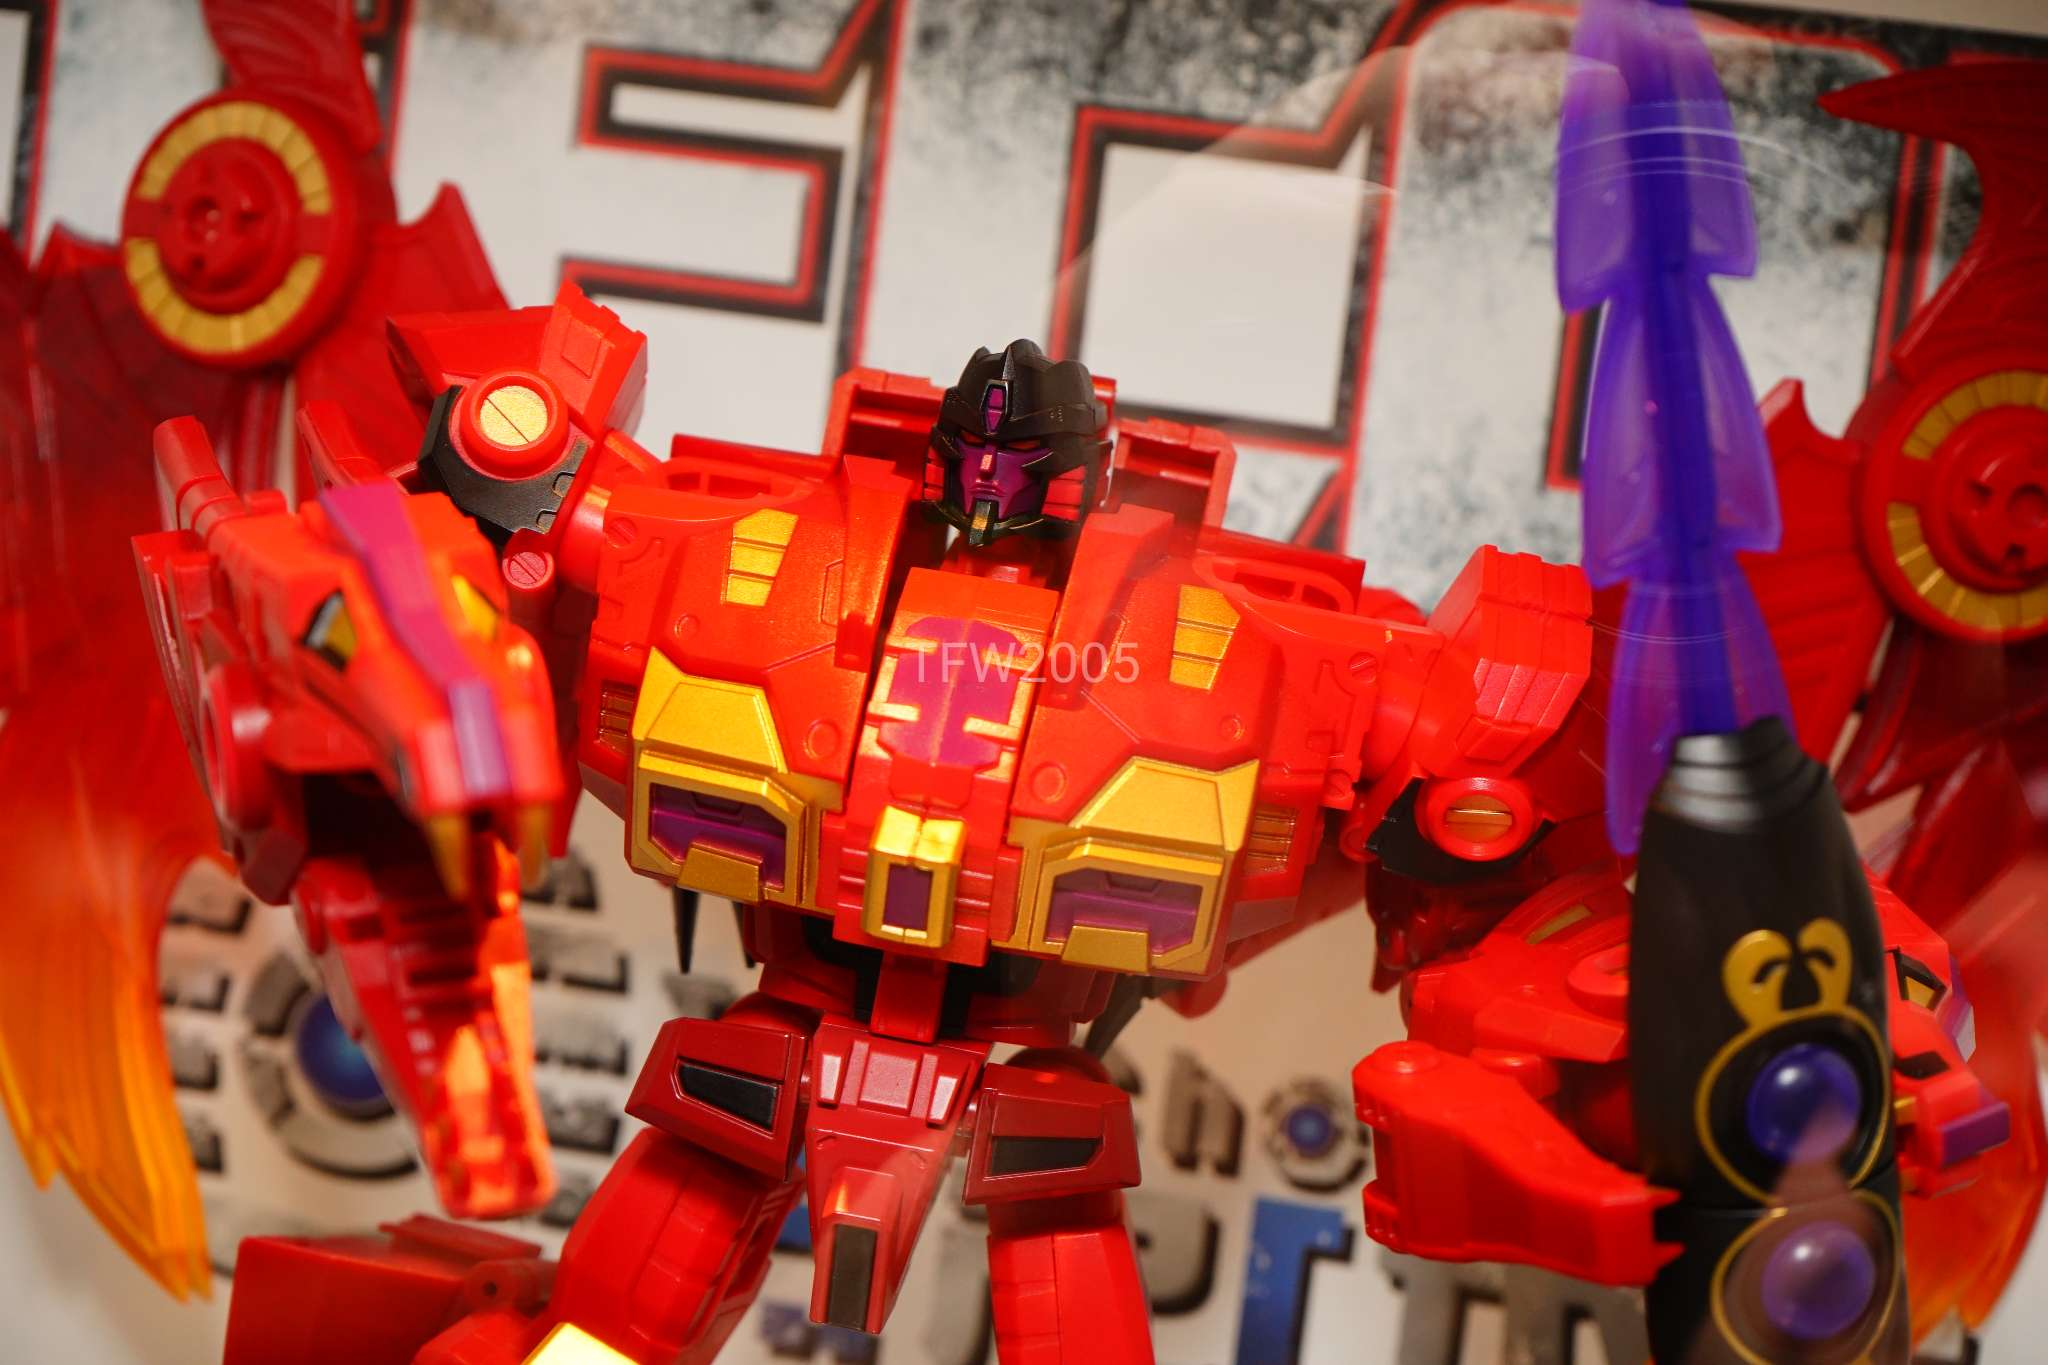 [FansHobby] Produit Tiers - Master Builder MB-03A Red Dragon - aka Transmetal 2 Mégatron (Beast Wars S3) Z61hfgvx_o